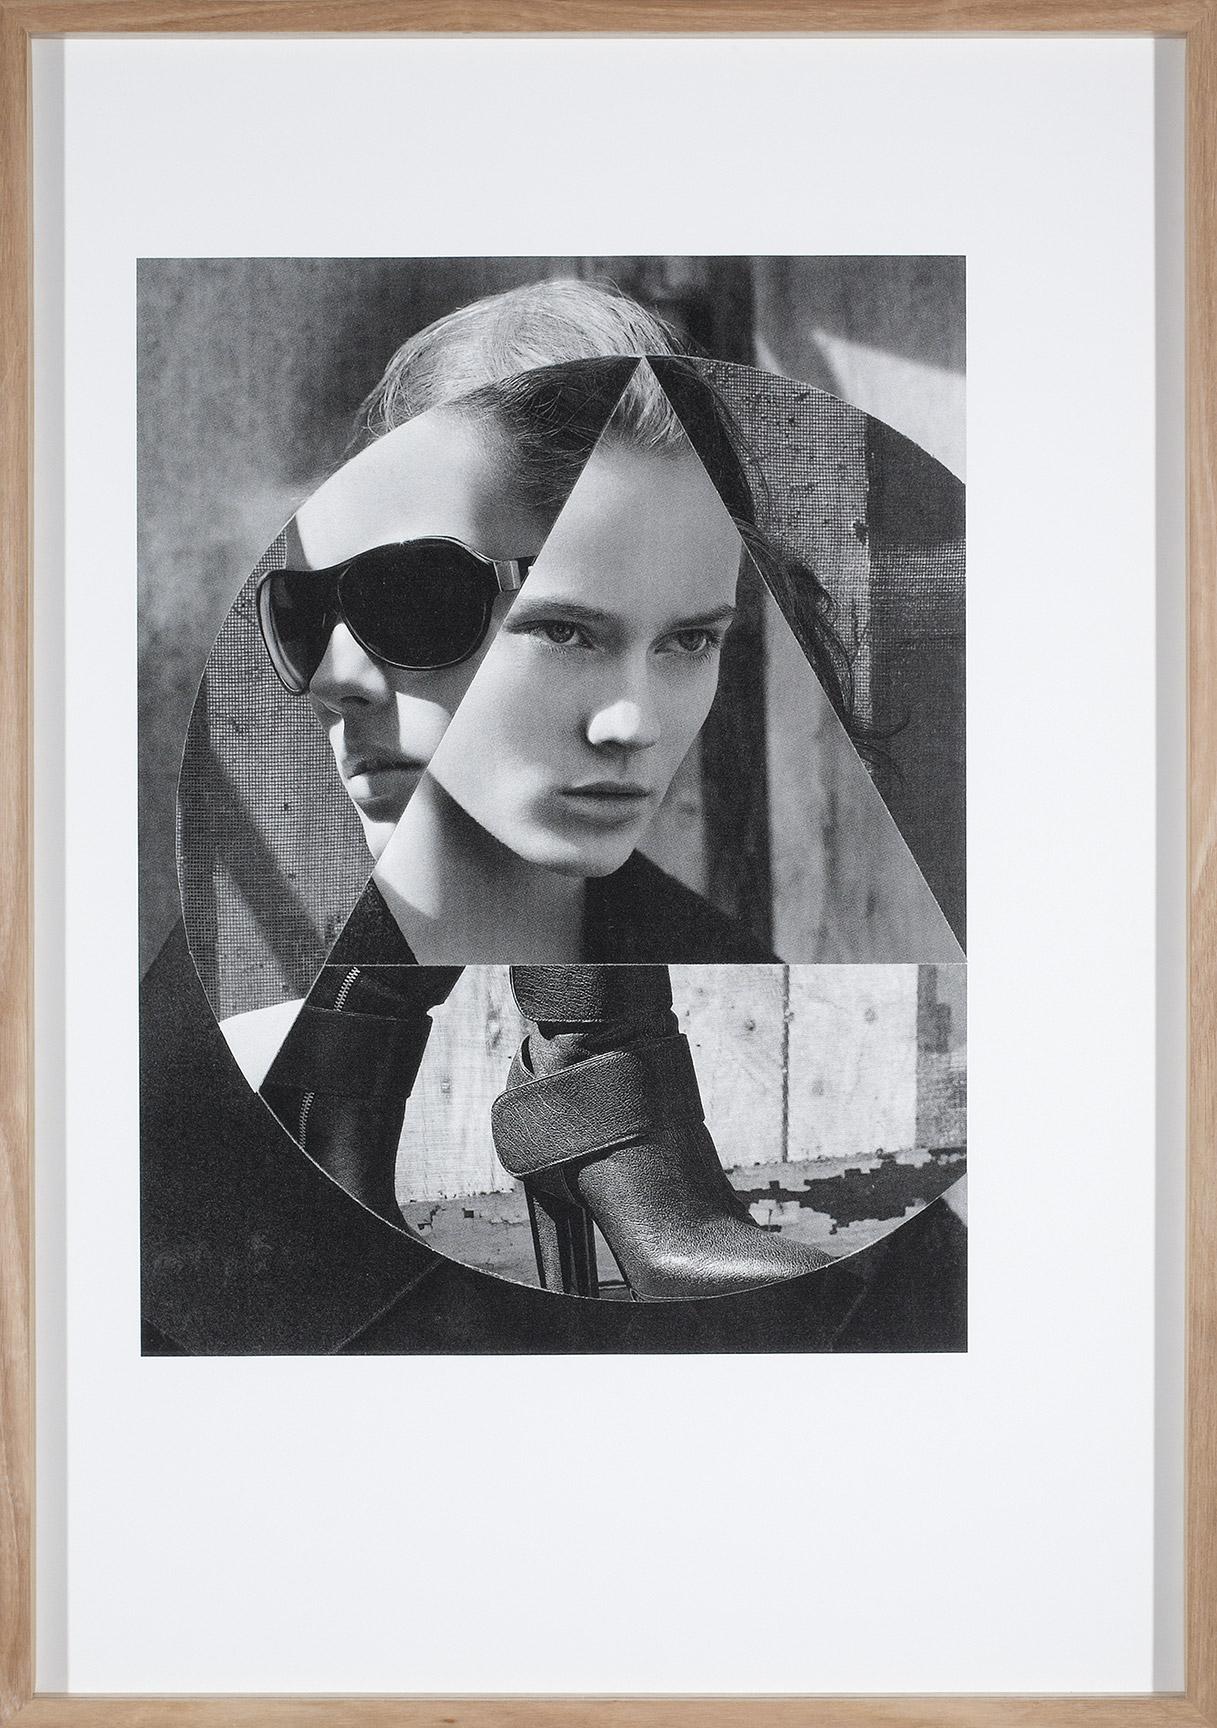 Brad Haylock,  Still Discontent CK46 , 2011, pigment print on paper, 84 x 59cm